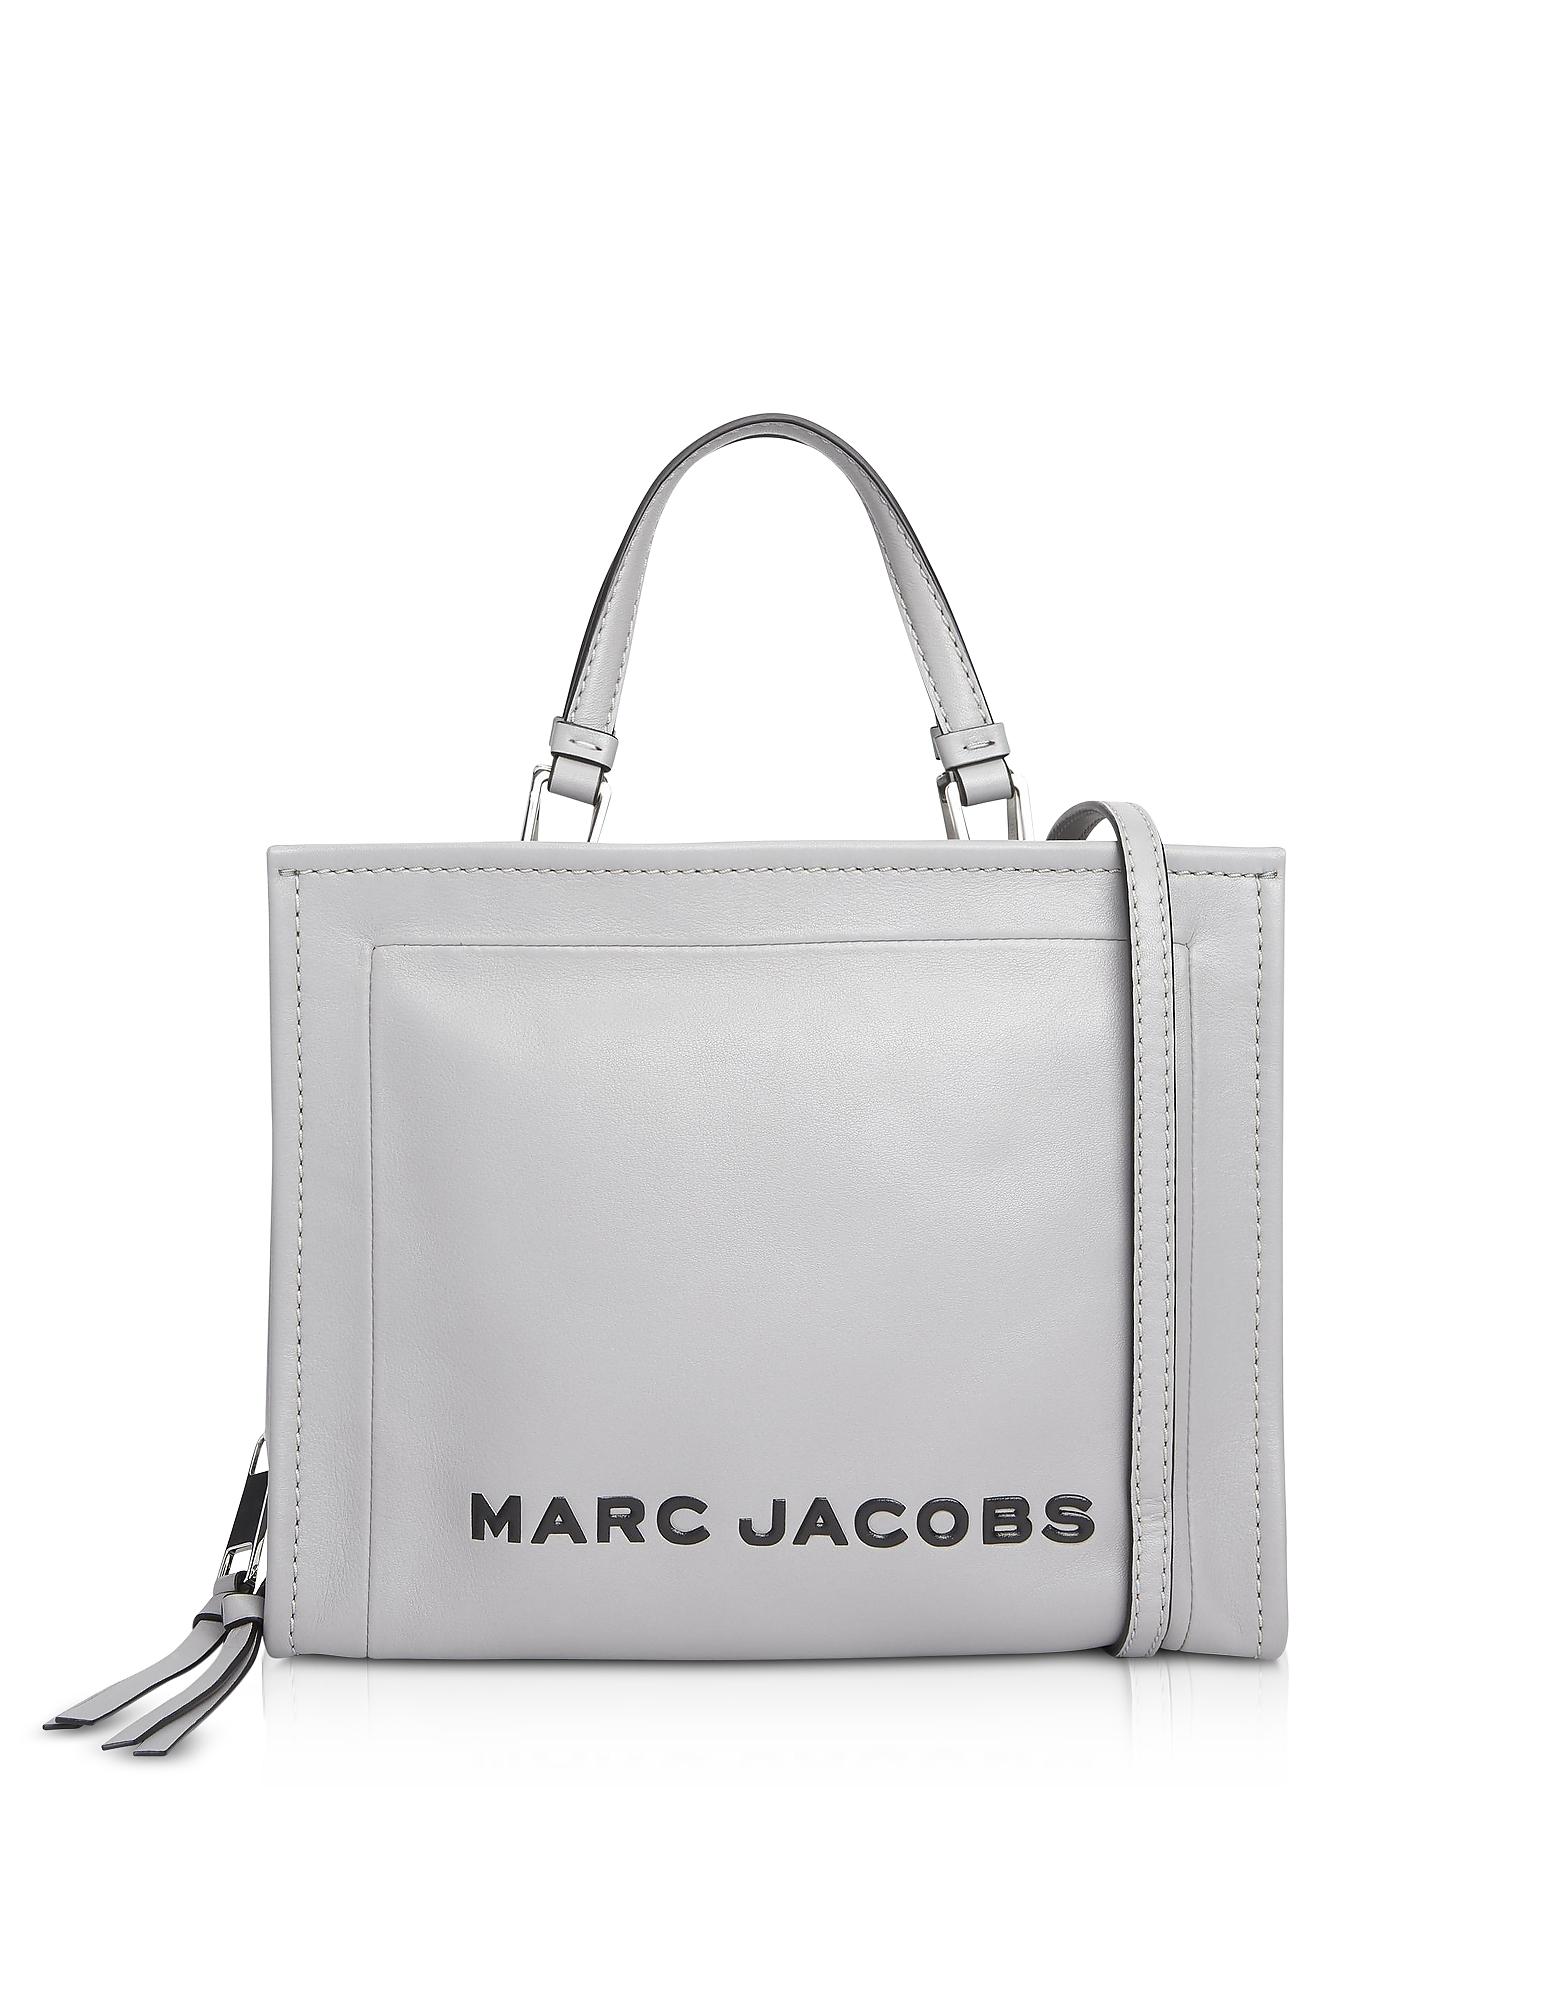 Marc Jacobs Handbags, The Box Shopper Bag